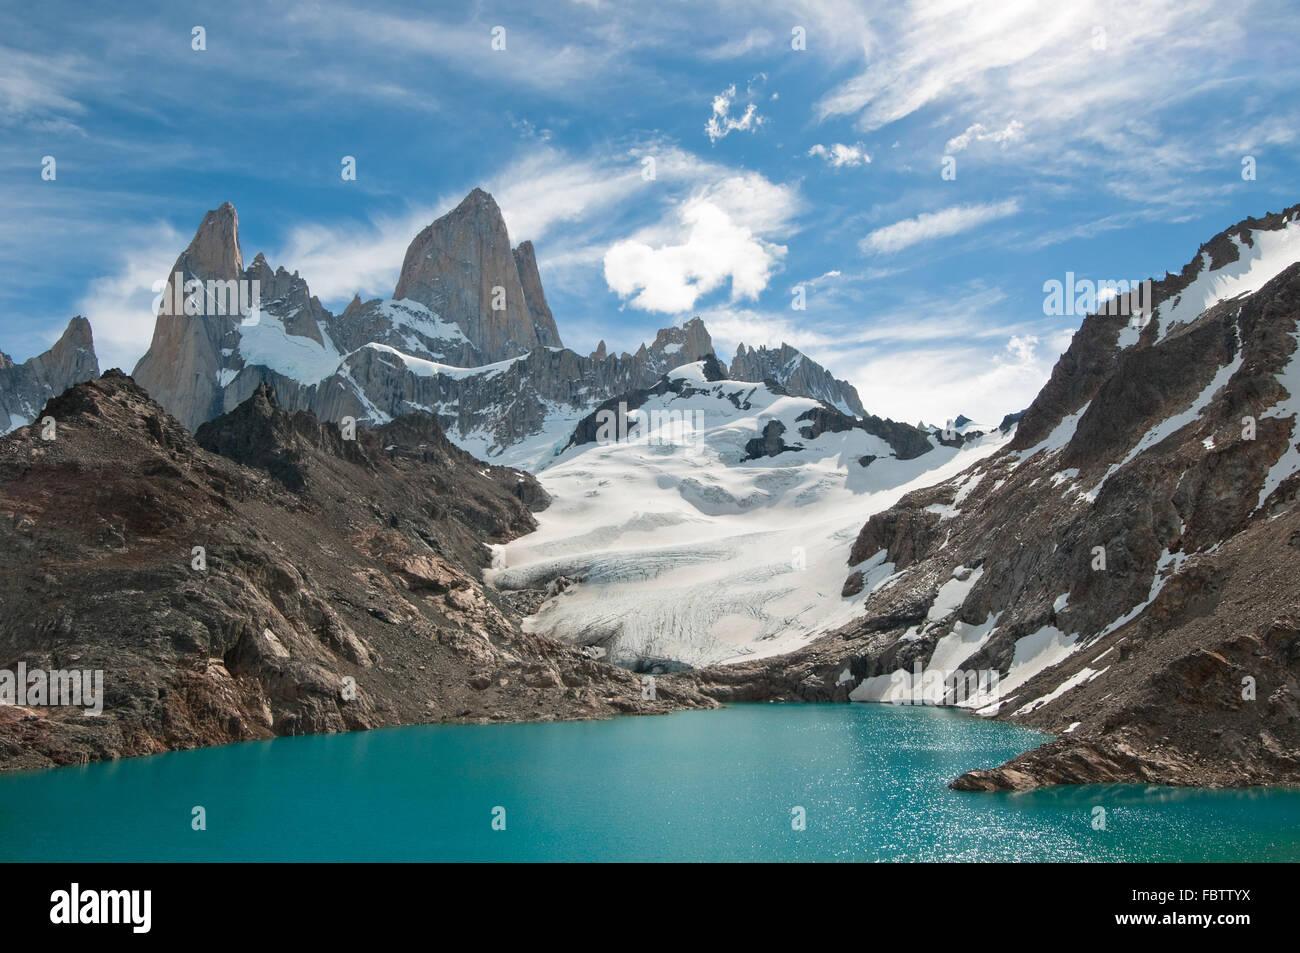 Fitz Roy mountain e la Laguna de los Tres, Patagonia, Argentina Immagini Stock